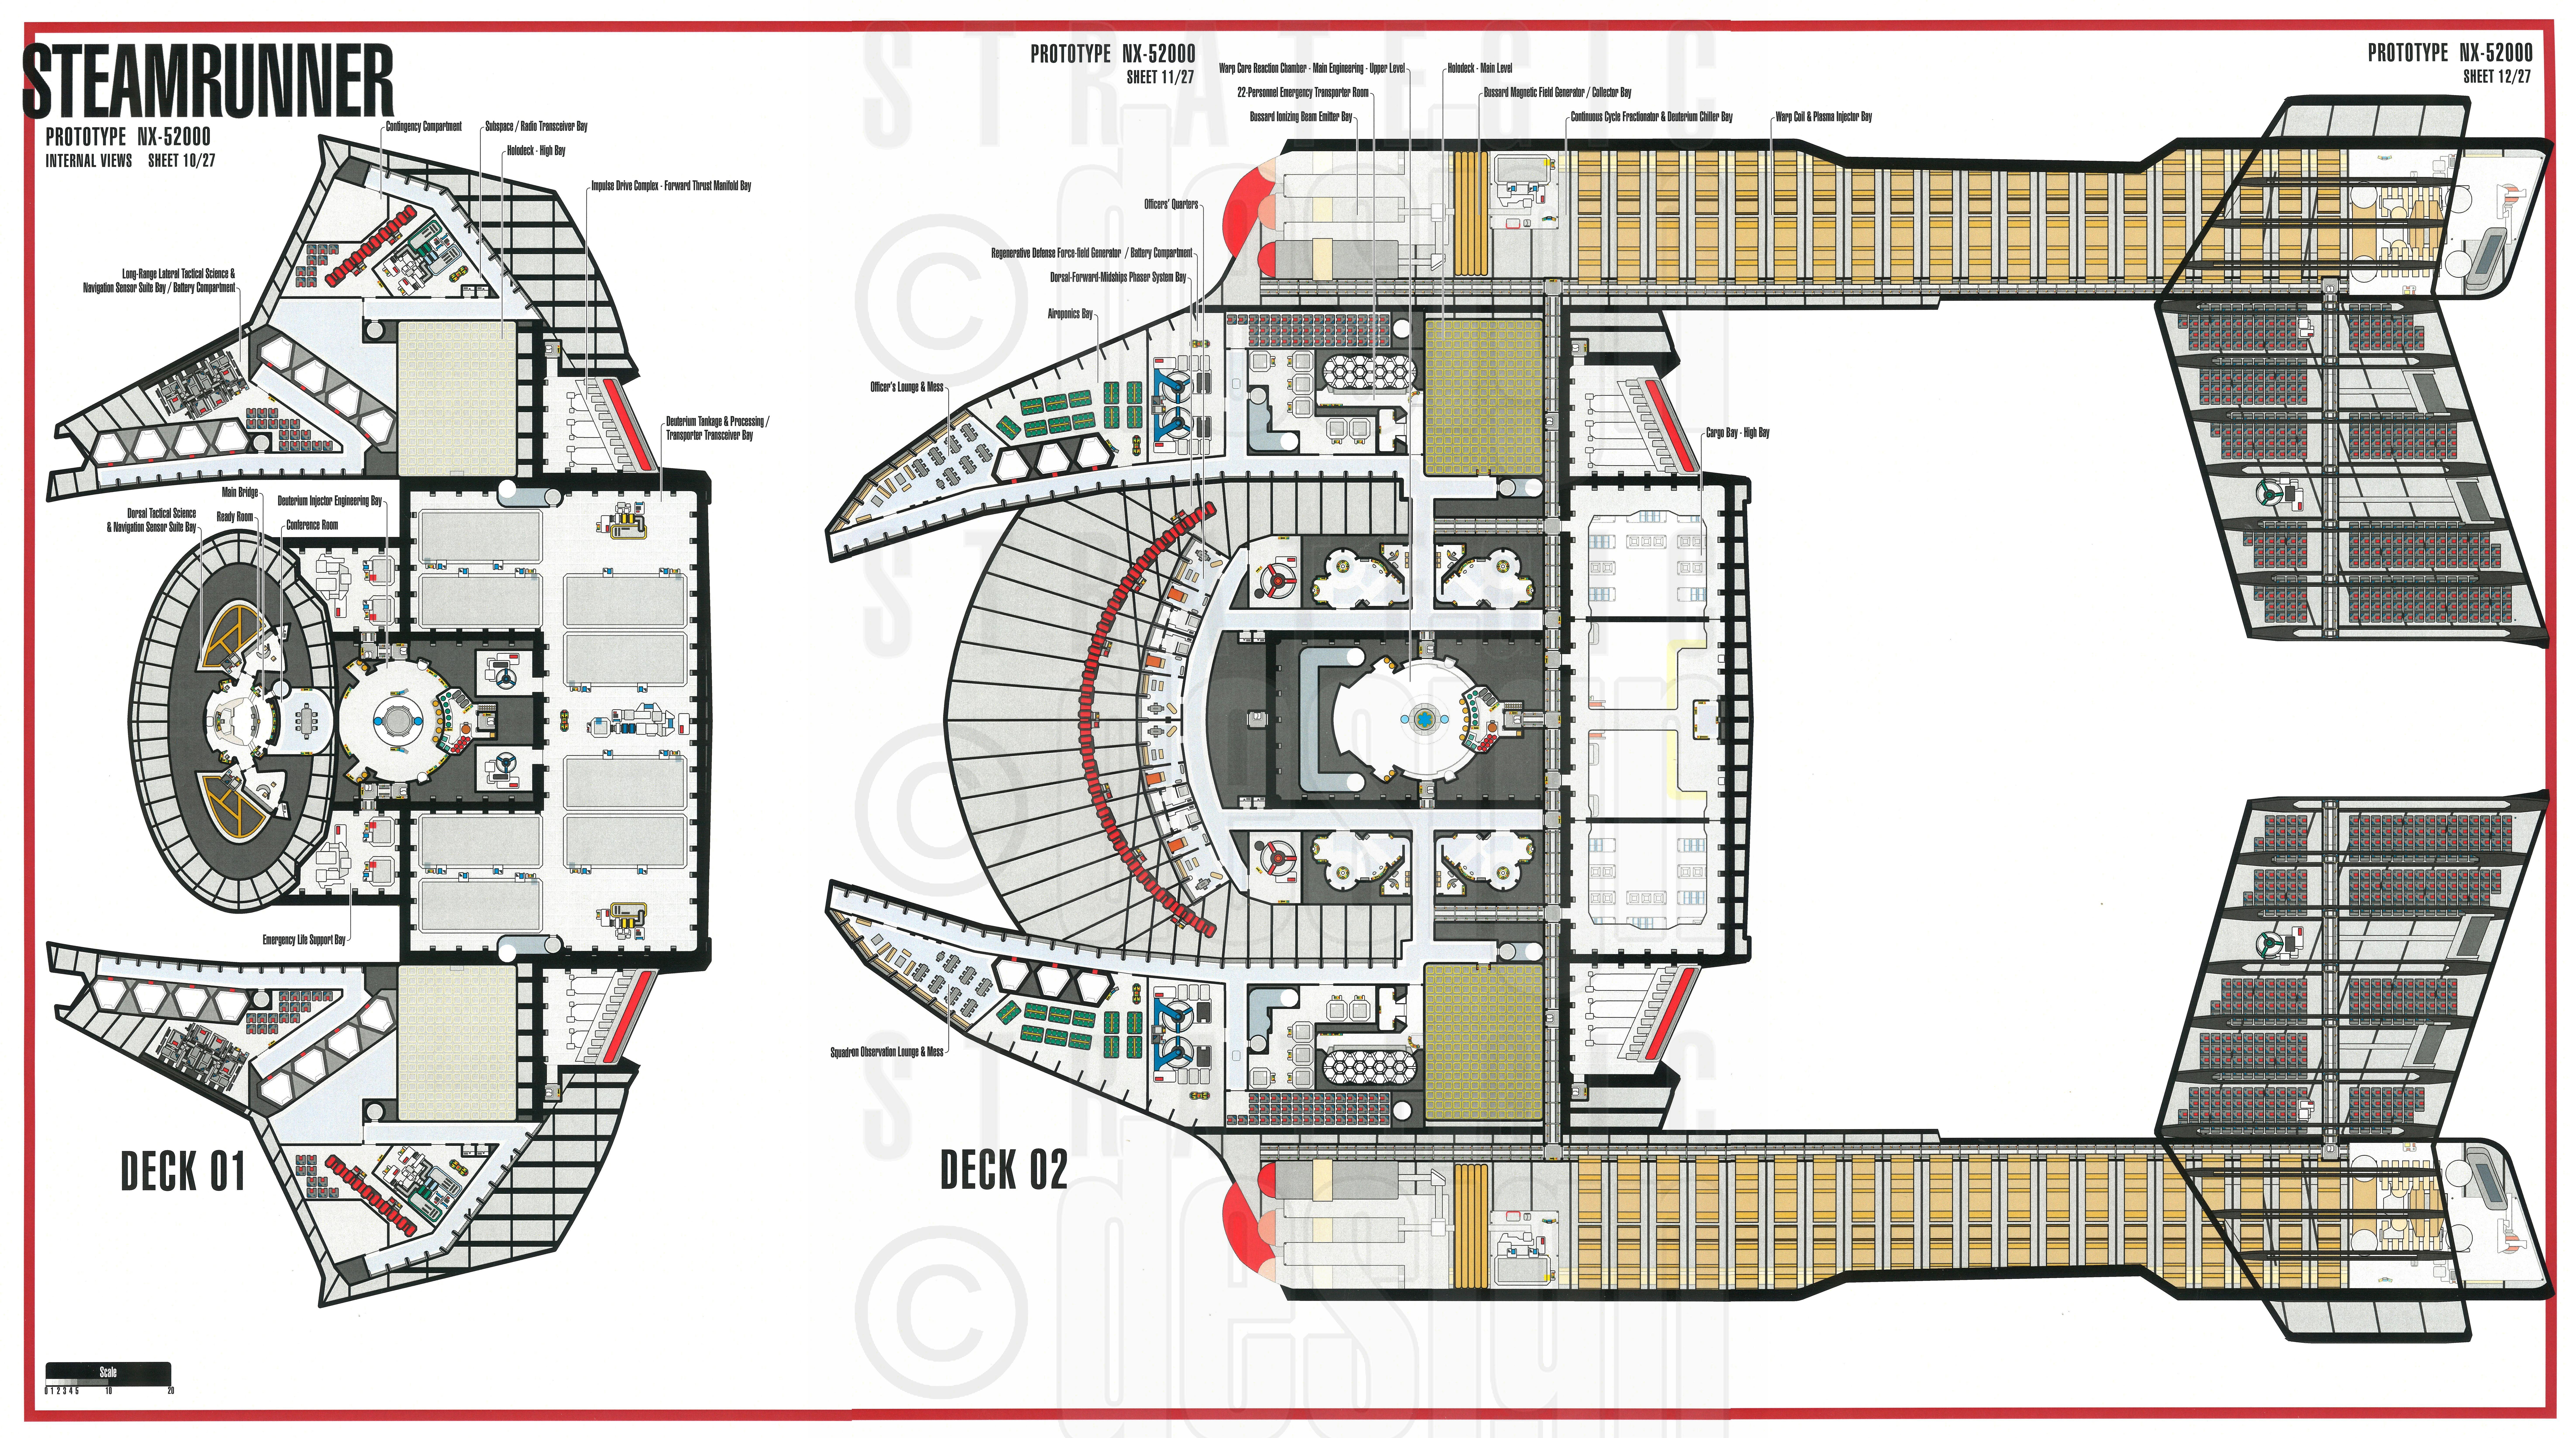 gallery for gt starship deck plans deck three floorplan of nova class starship star trek